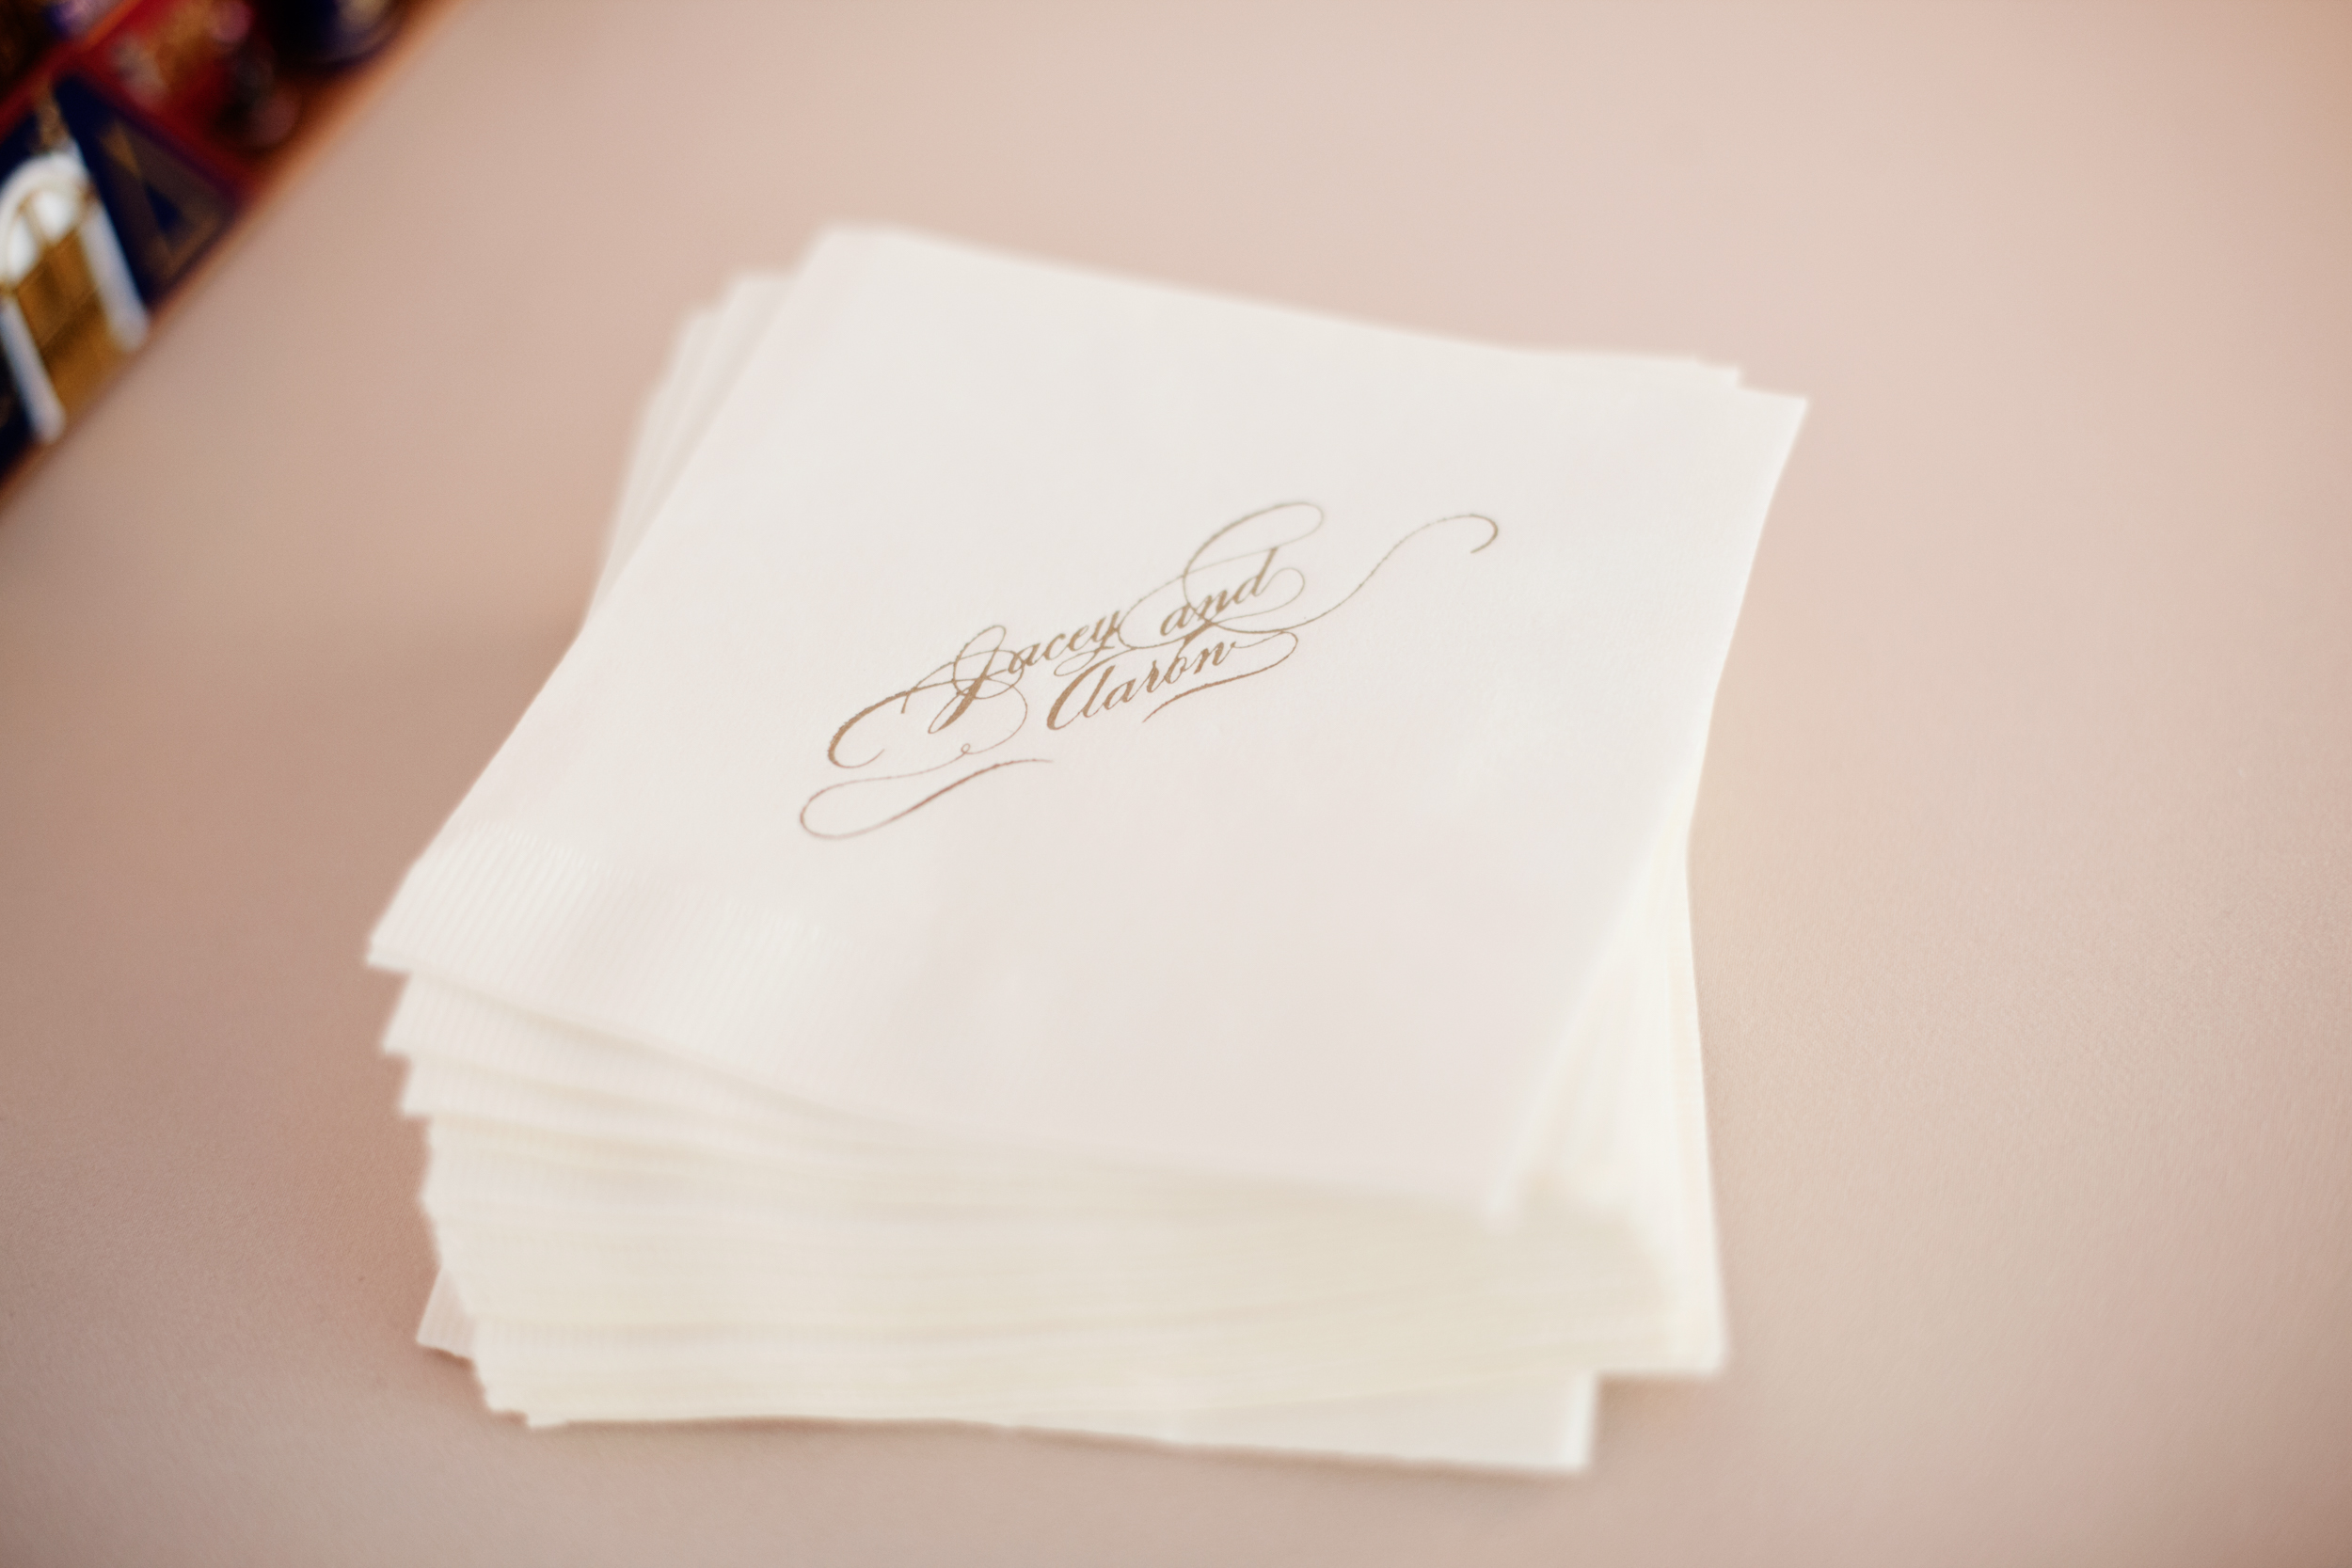 Ceci_New_York_Ceci_Style_Ceci_Johnson_Luxury_Lifestyle_Floral_Lace_Wedding_Letterpress_Inspiration_Design_Custom_Couture_Personalized_Invitations_-65.jpg